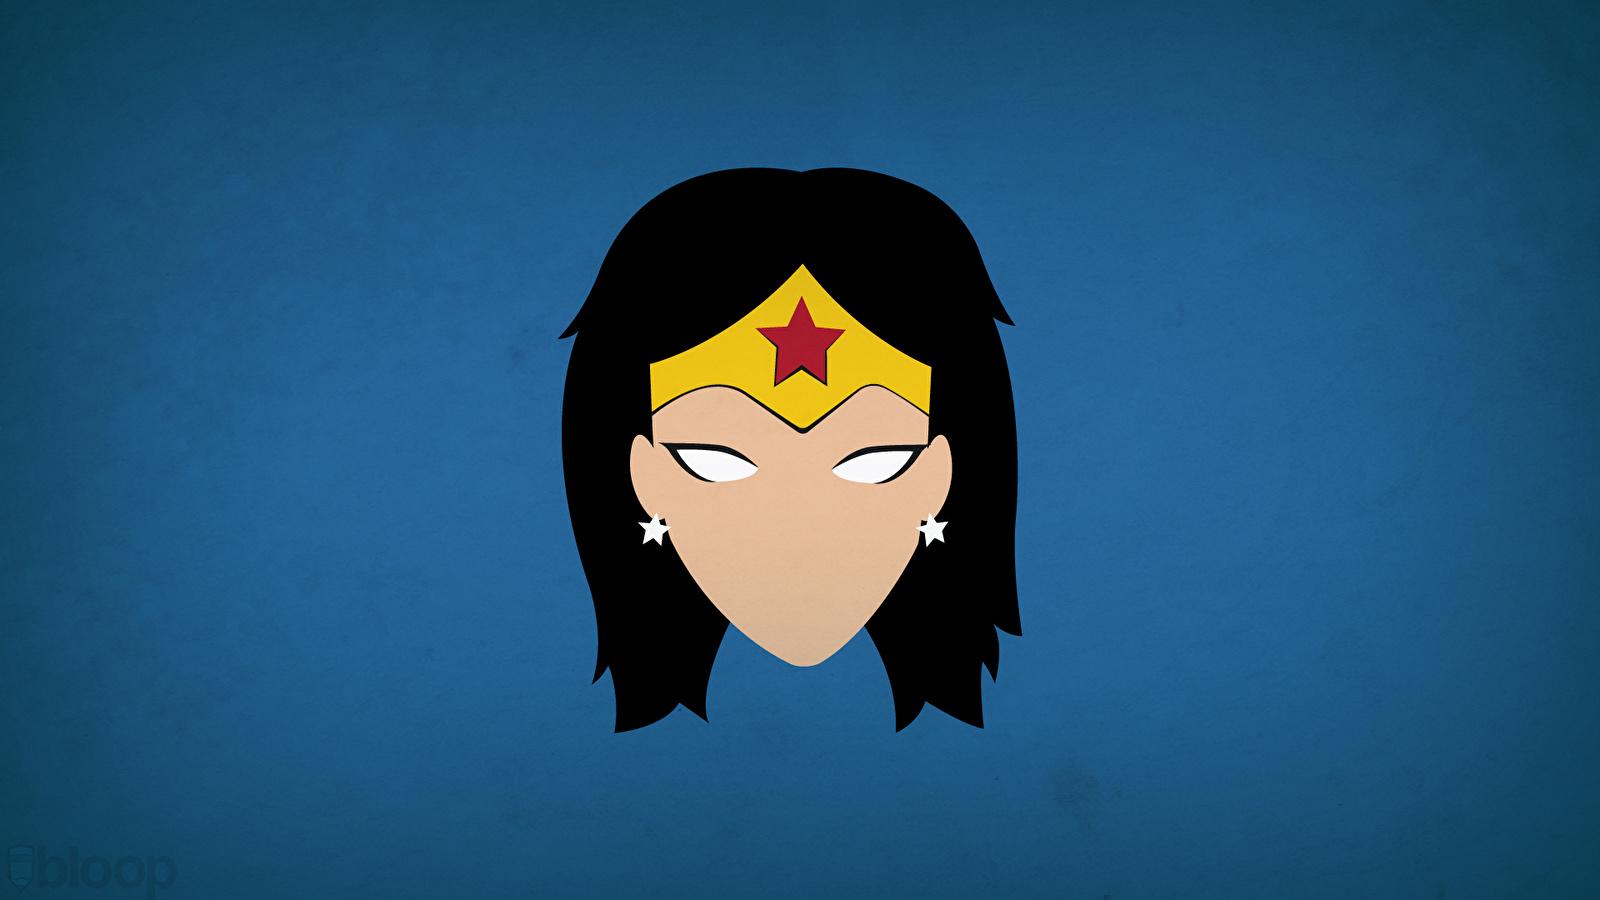 1600x900 Photo Heroes Comics Wonder Woman Hero Head Vector Graphics 1600x900